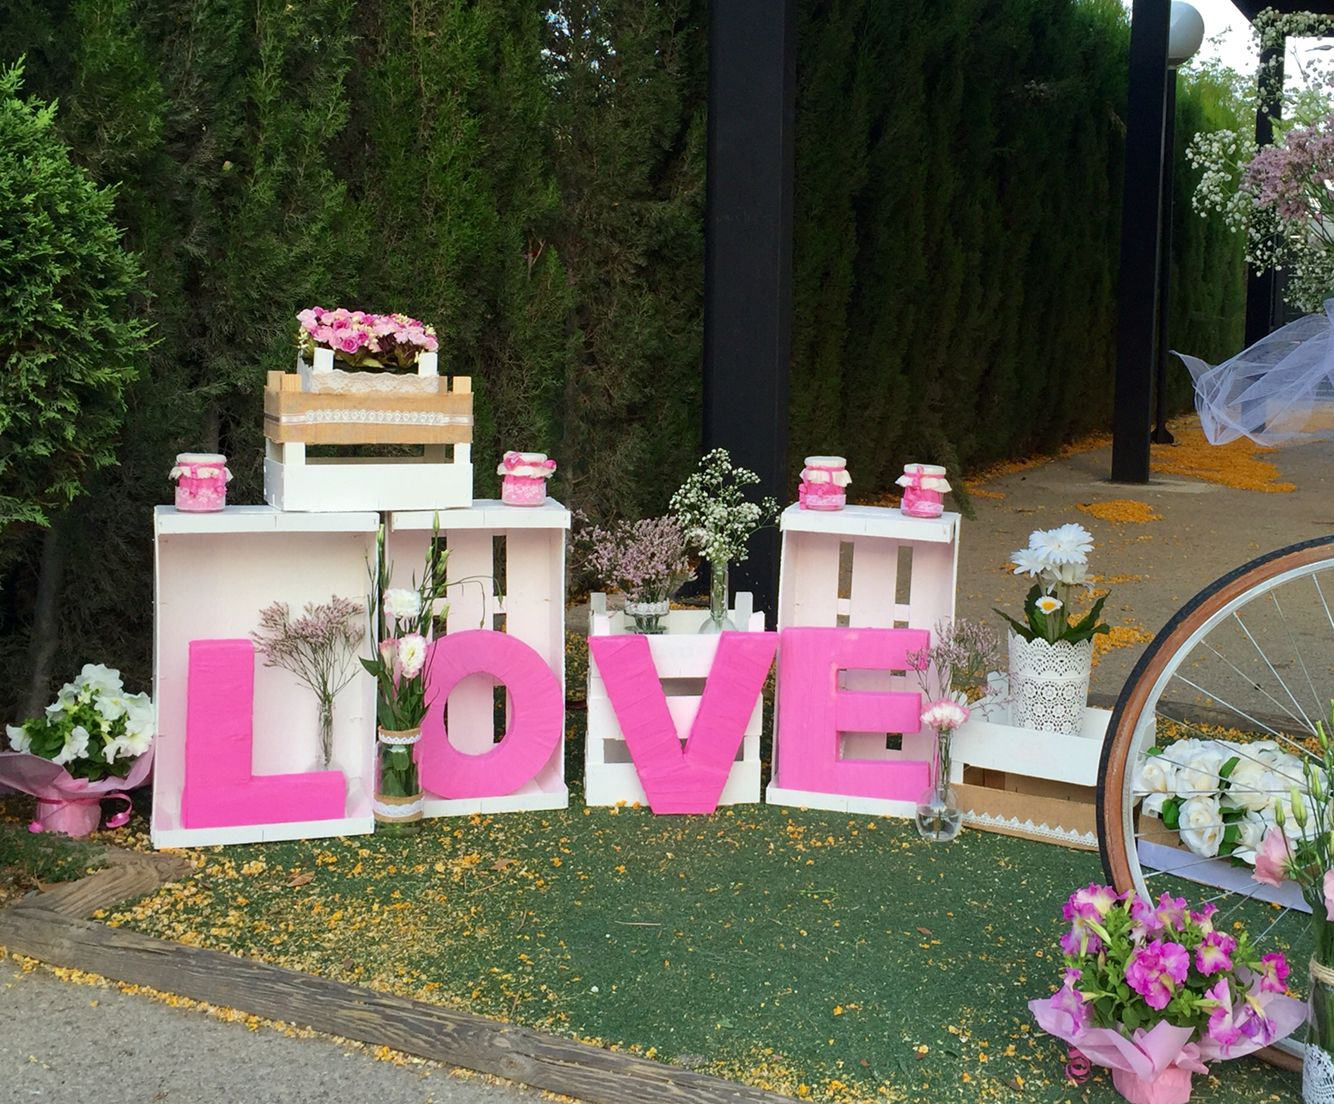 Decoracion boda vintage rom ntica bici con flores for Decoracion romantica vintage